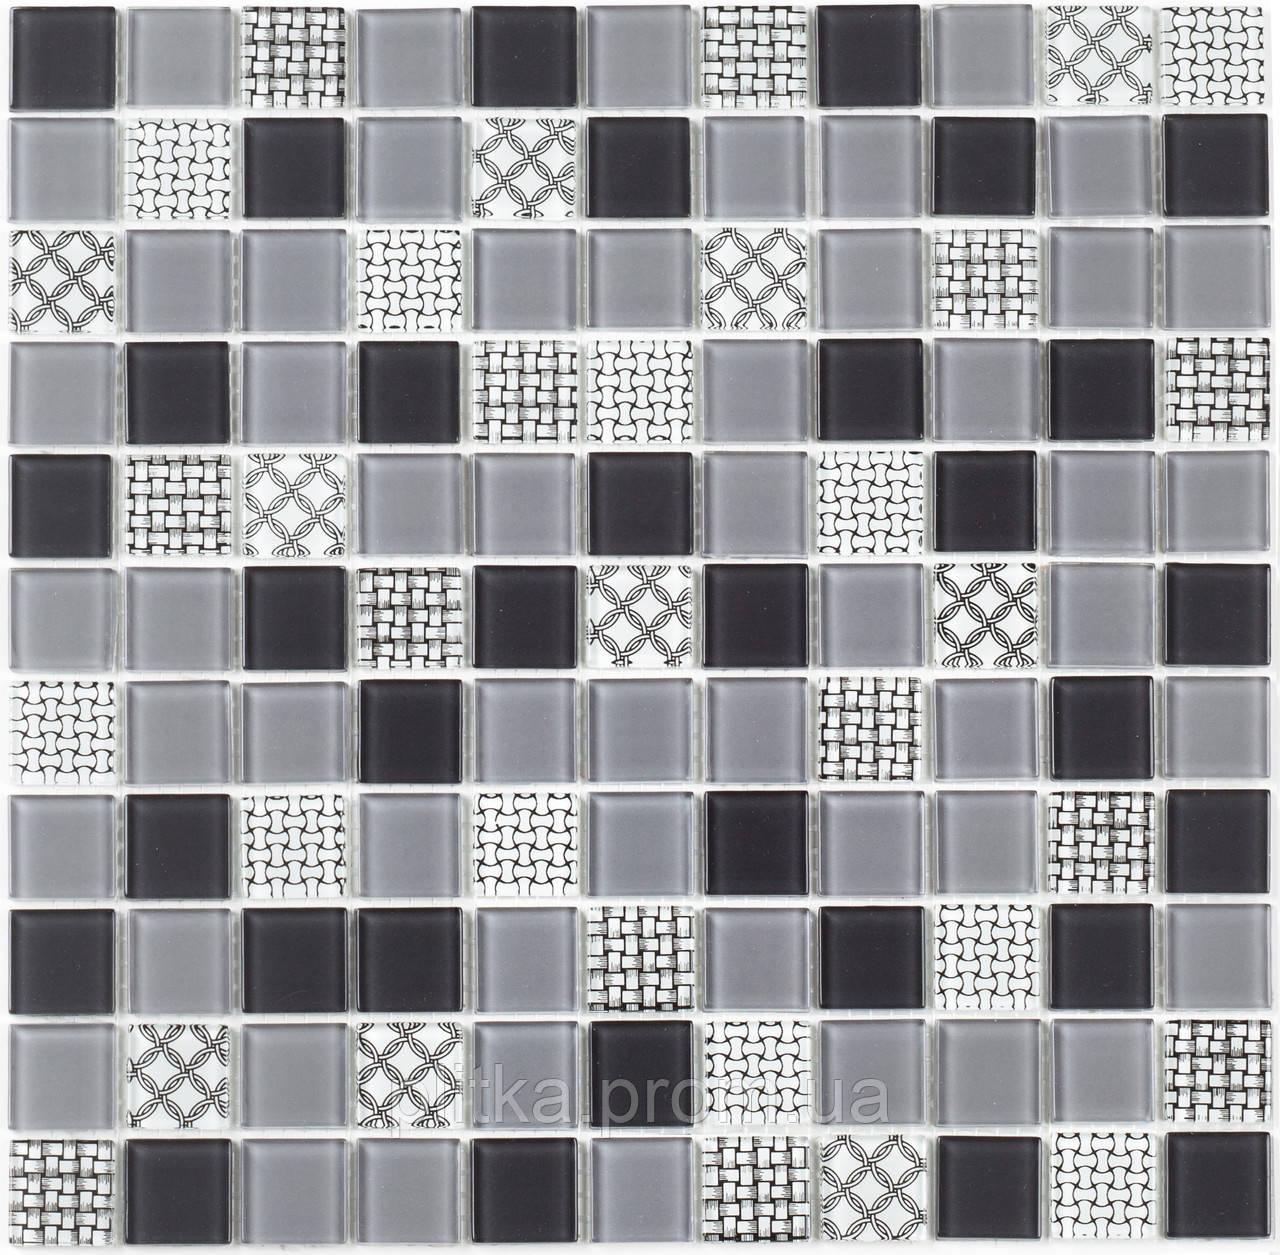 Мозаика GM 4053 C3 Gray m/Gray w/Structure 30х30